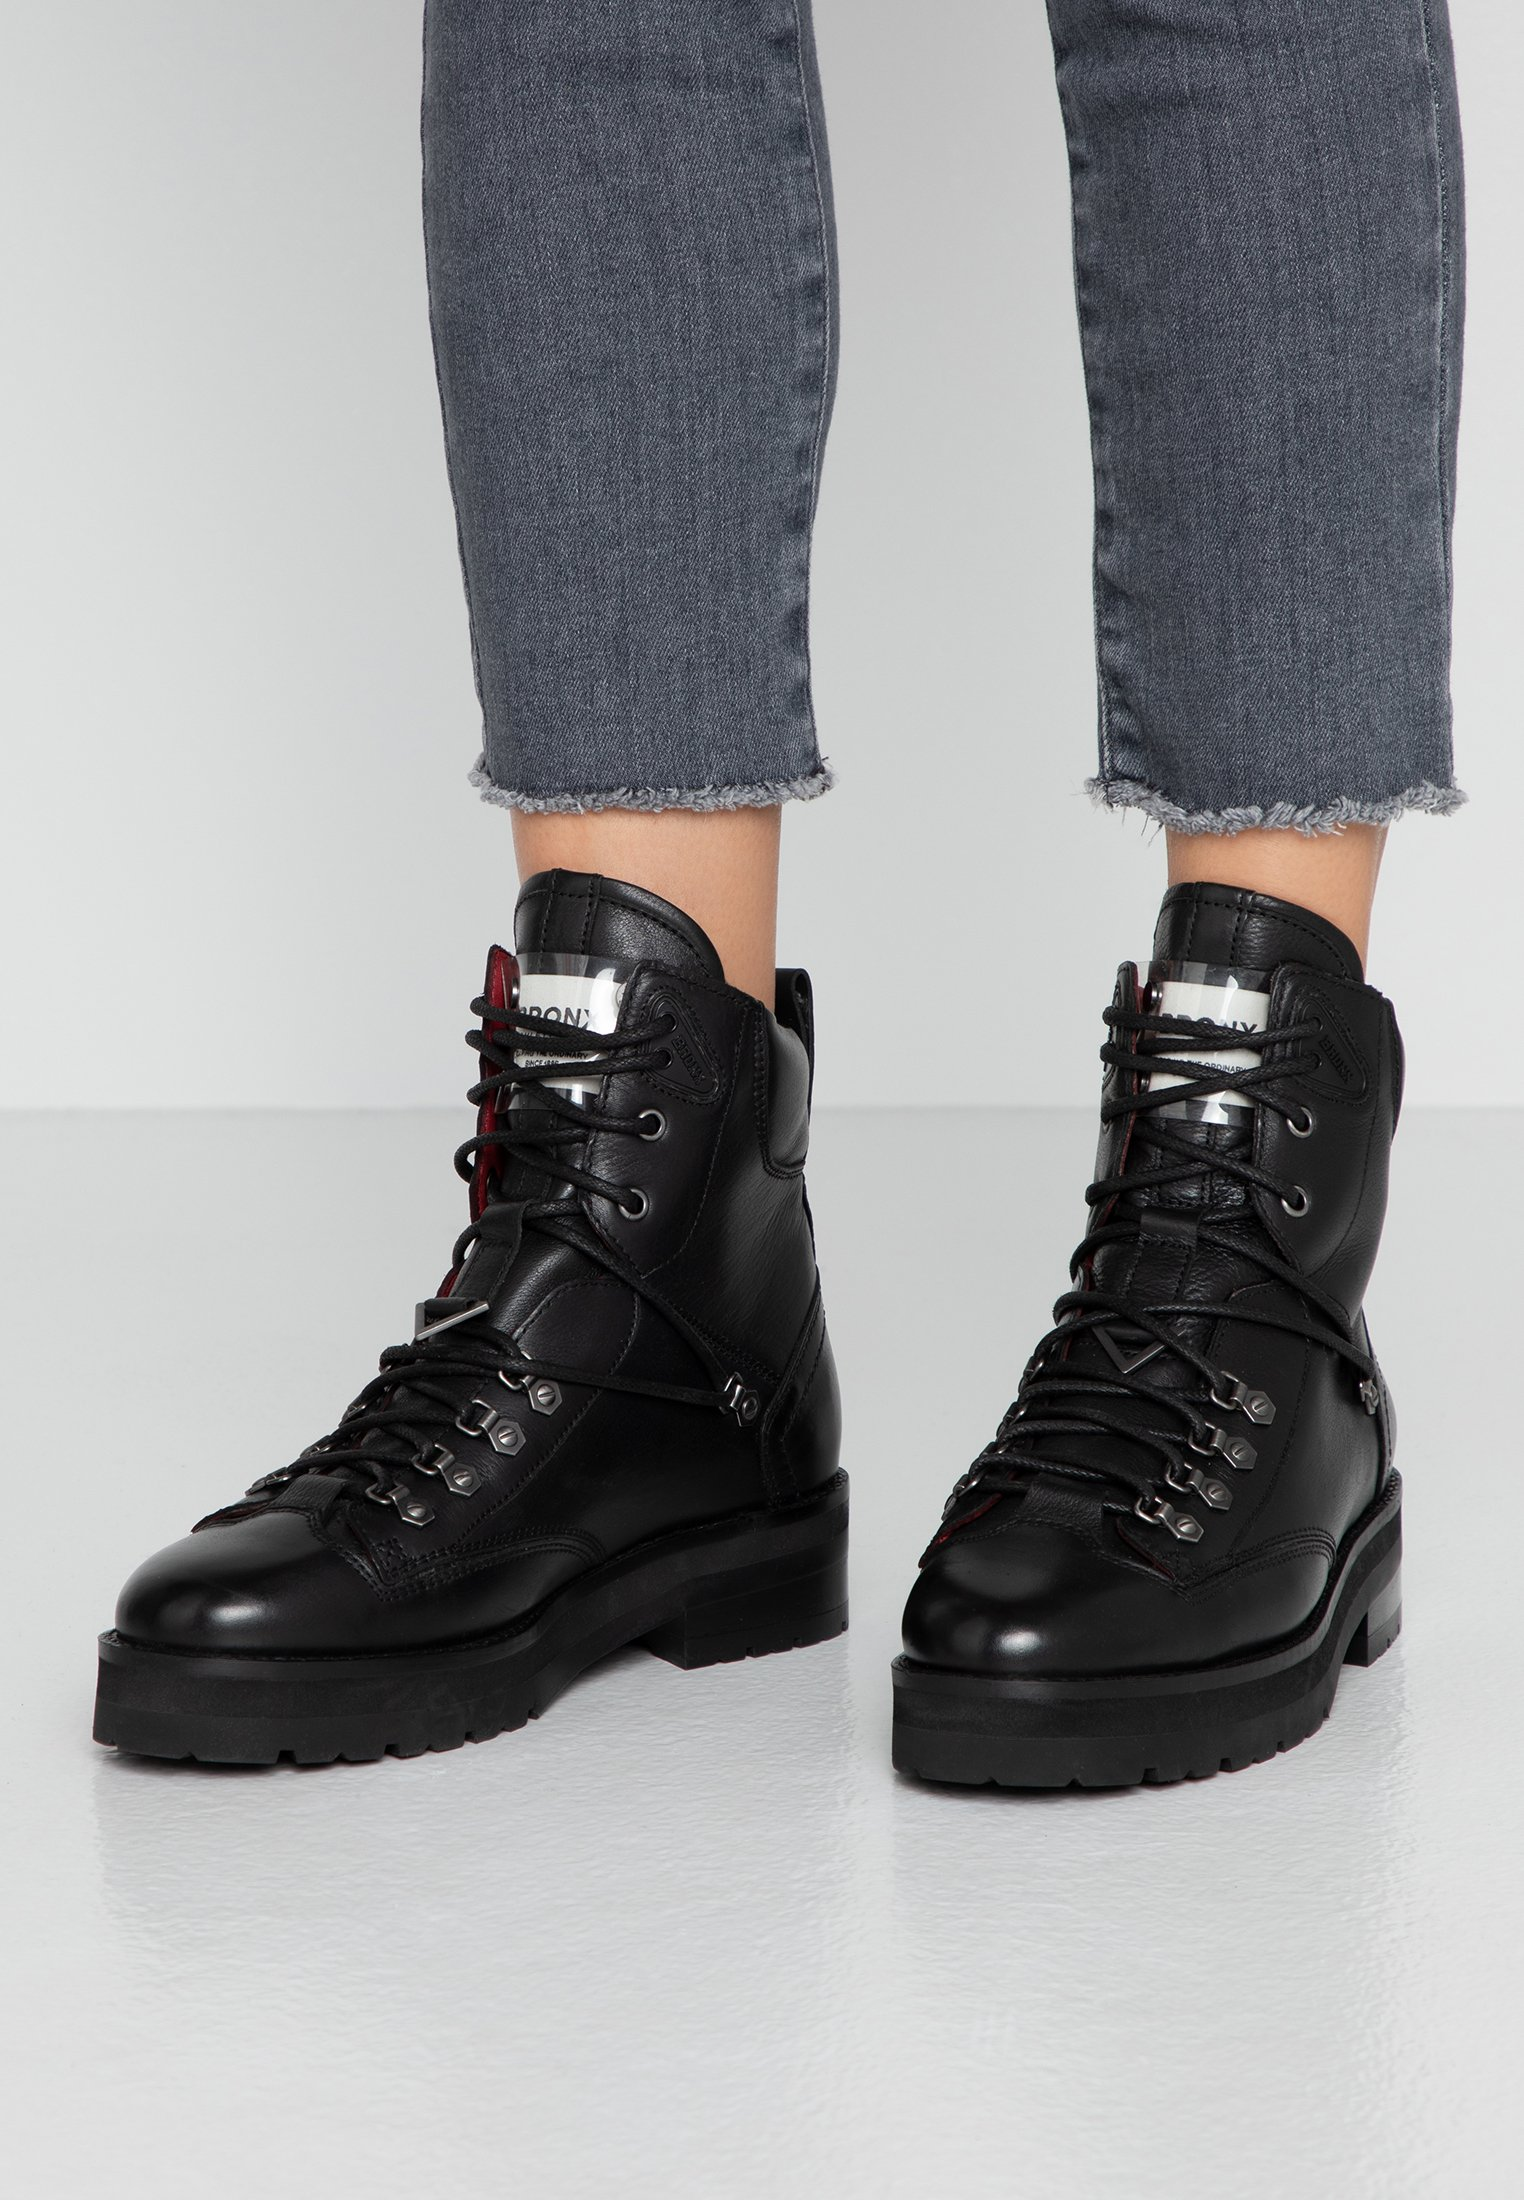 Svarta Bronx Skor & kläder online. Alltid Fri Frakt & Retur